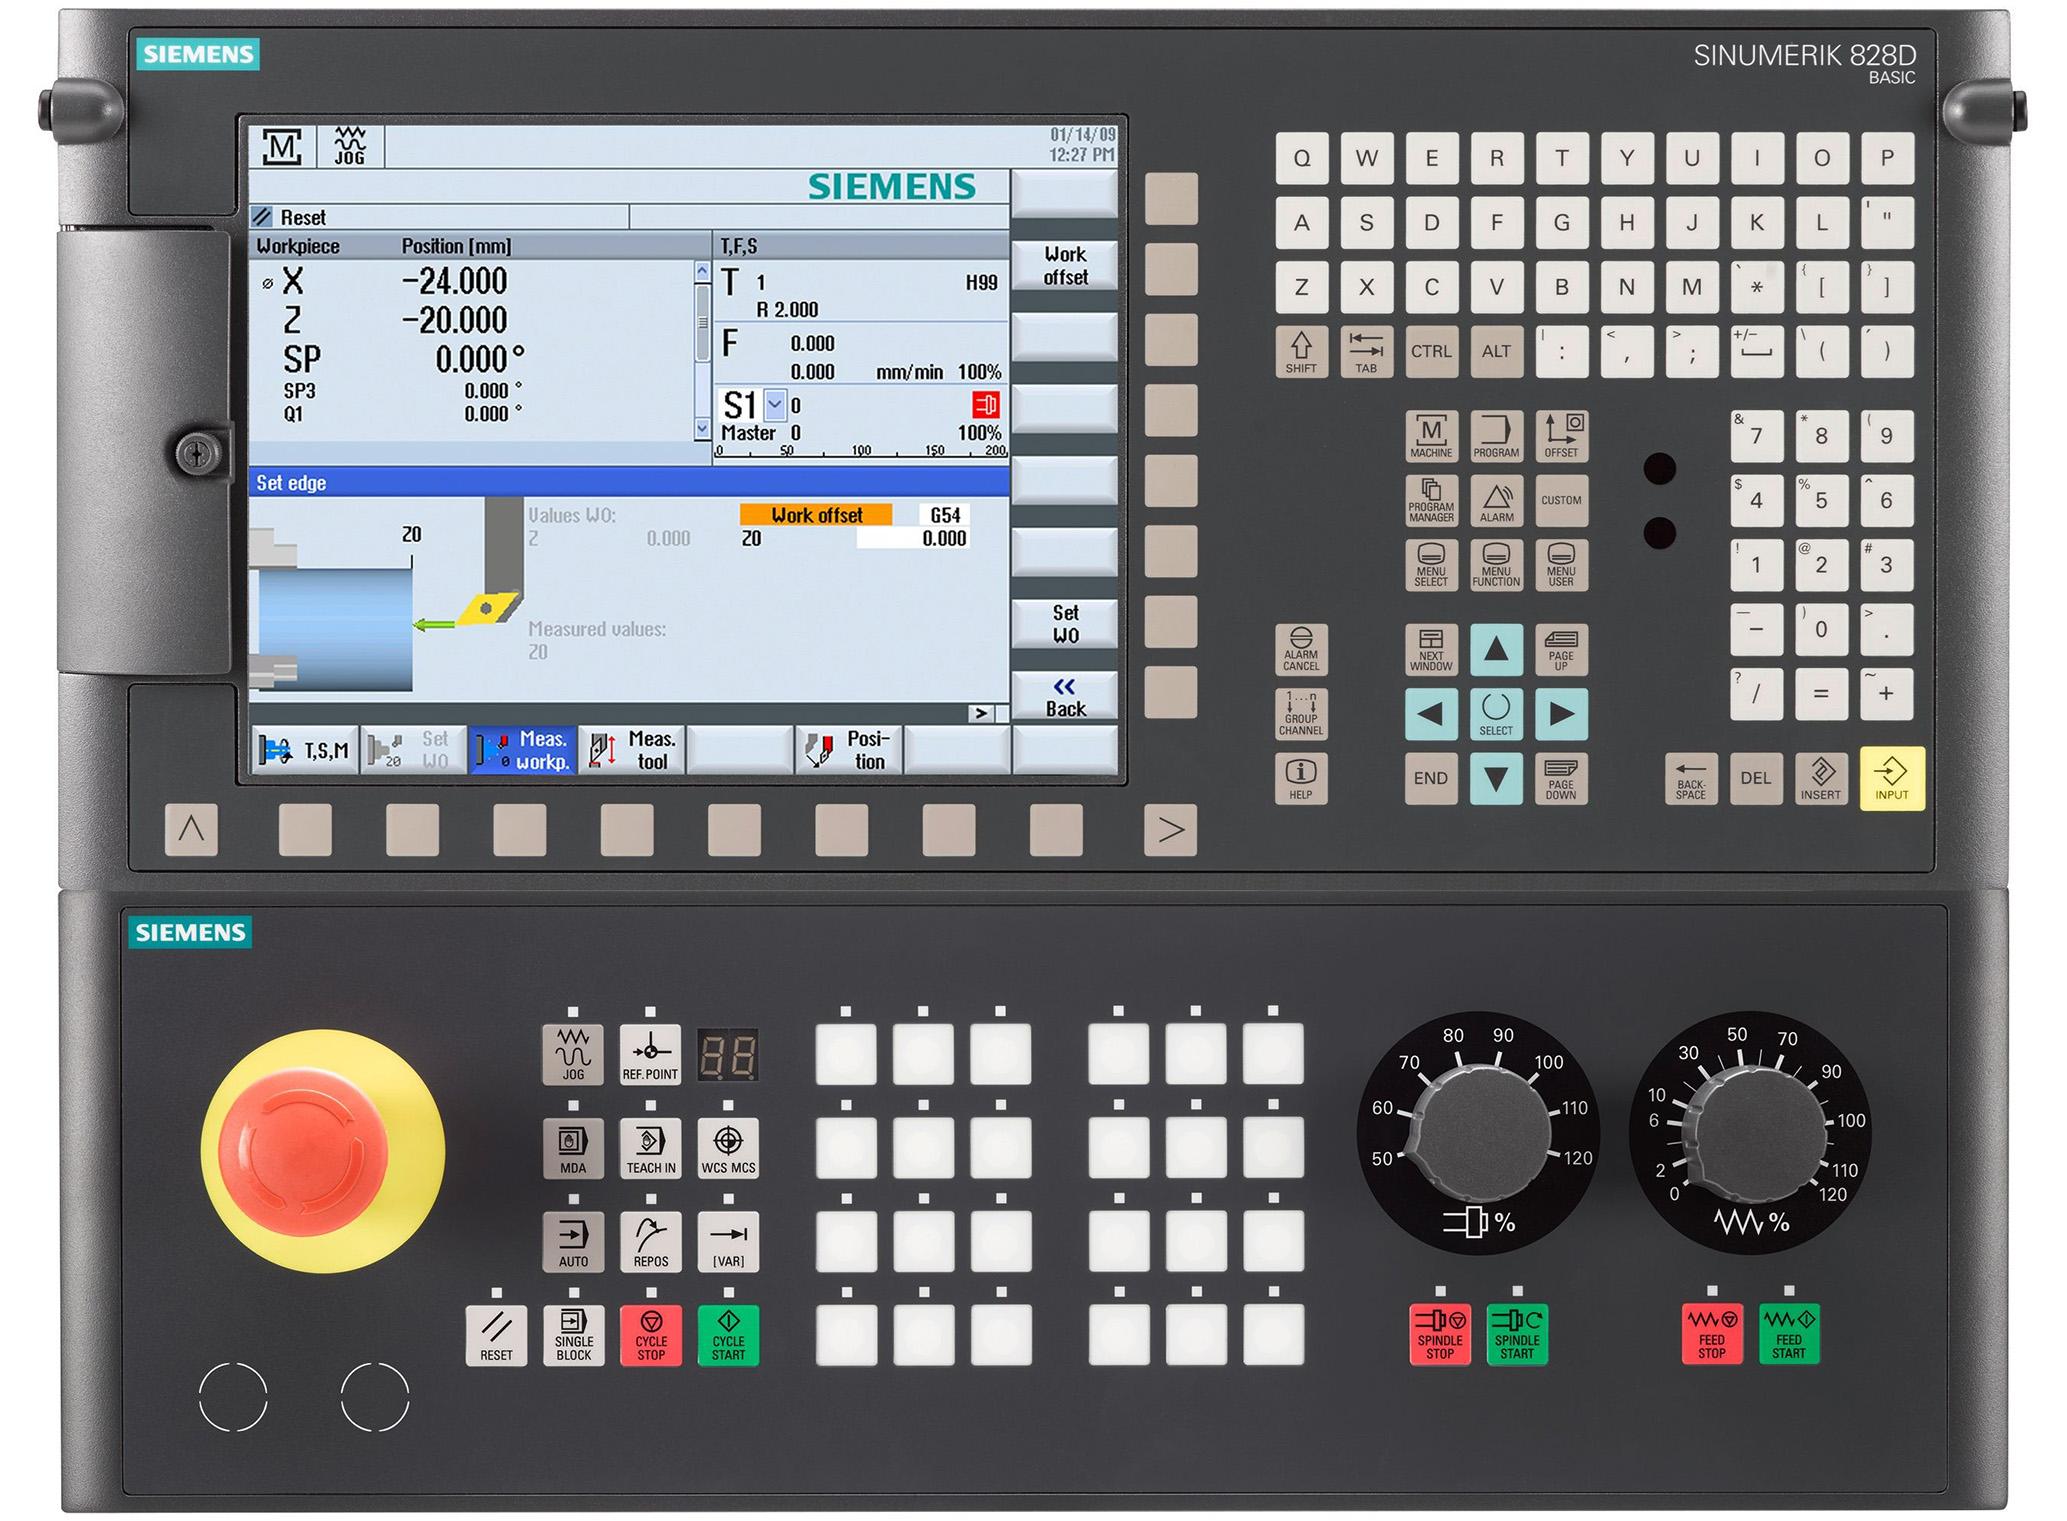 SIEMENS 828D controller for CNC cutting machine